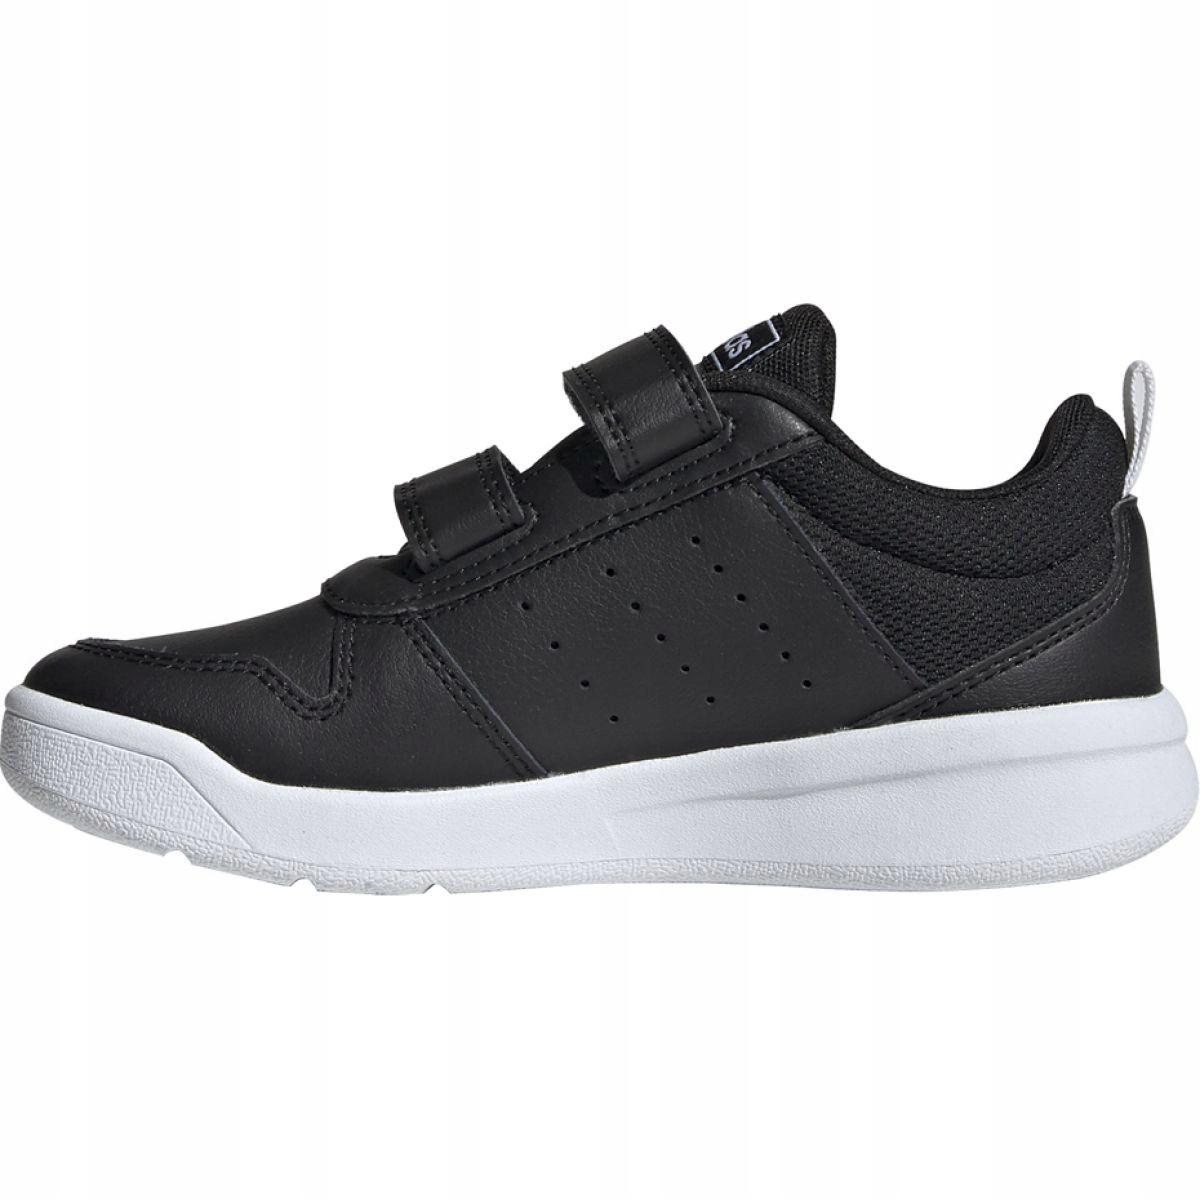 JrEf1092 Chaussures Adidas Tensaur Noir C xeCoWrdQBE